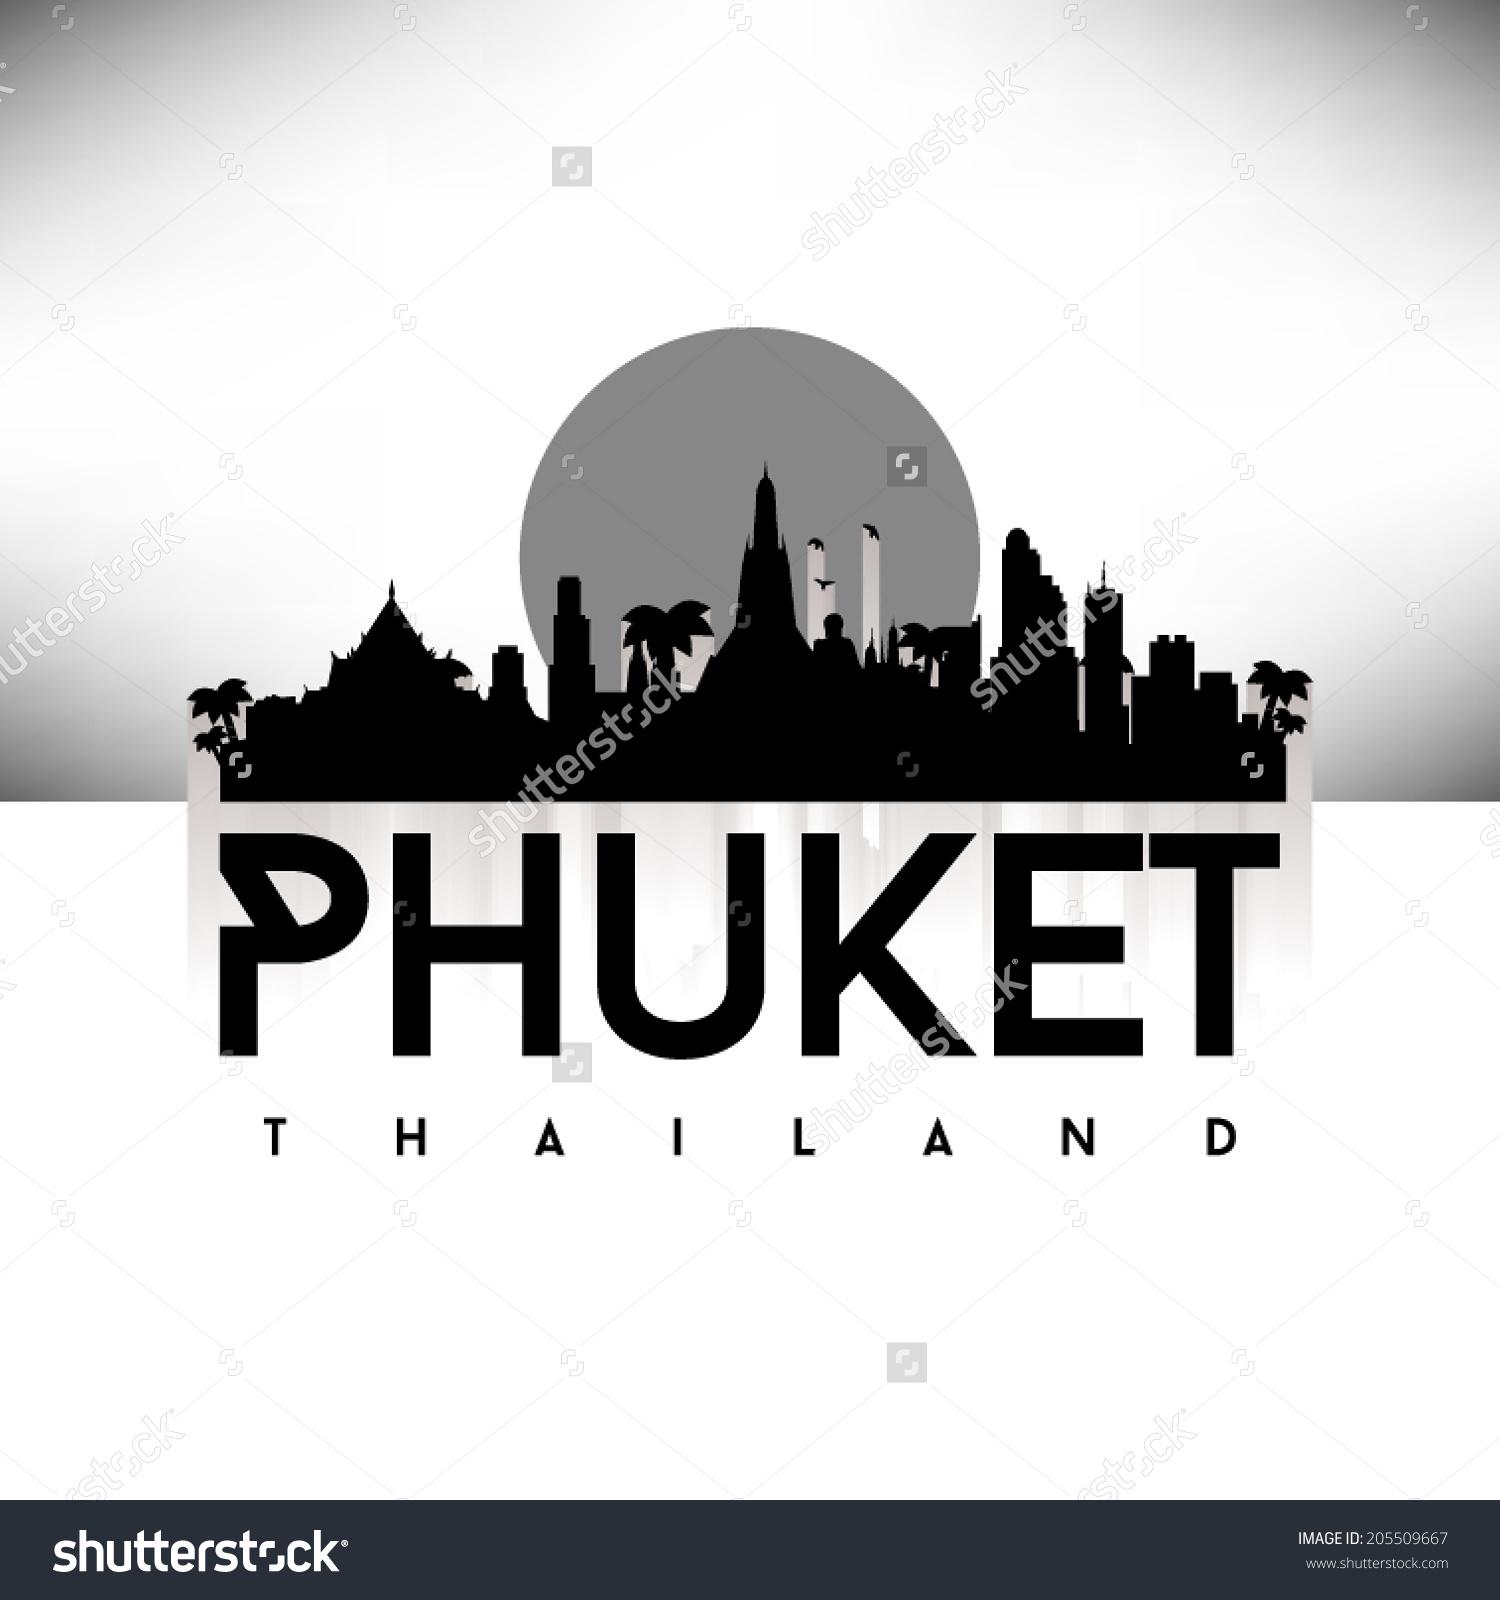 Phuket clipart.